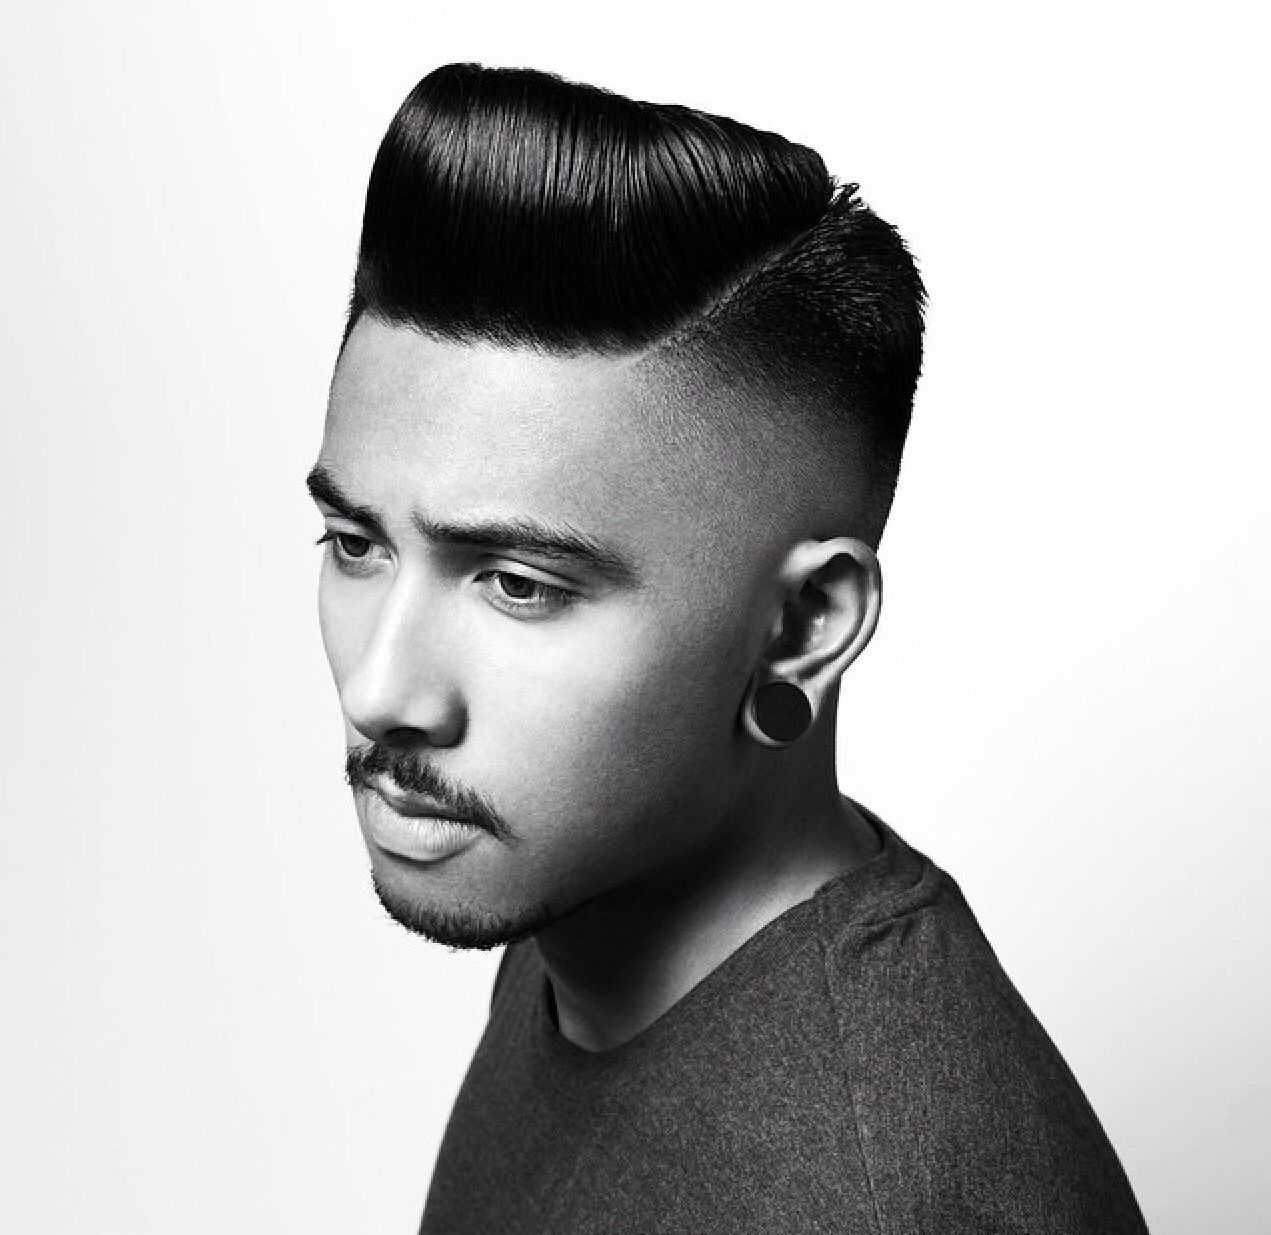 Source Schorem Haarsnijder En Barbier Facebook Com Schorem Men S Haircut Mens Hairstyles Hair Salon Design Haircuts For Men